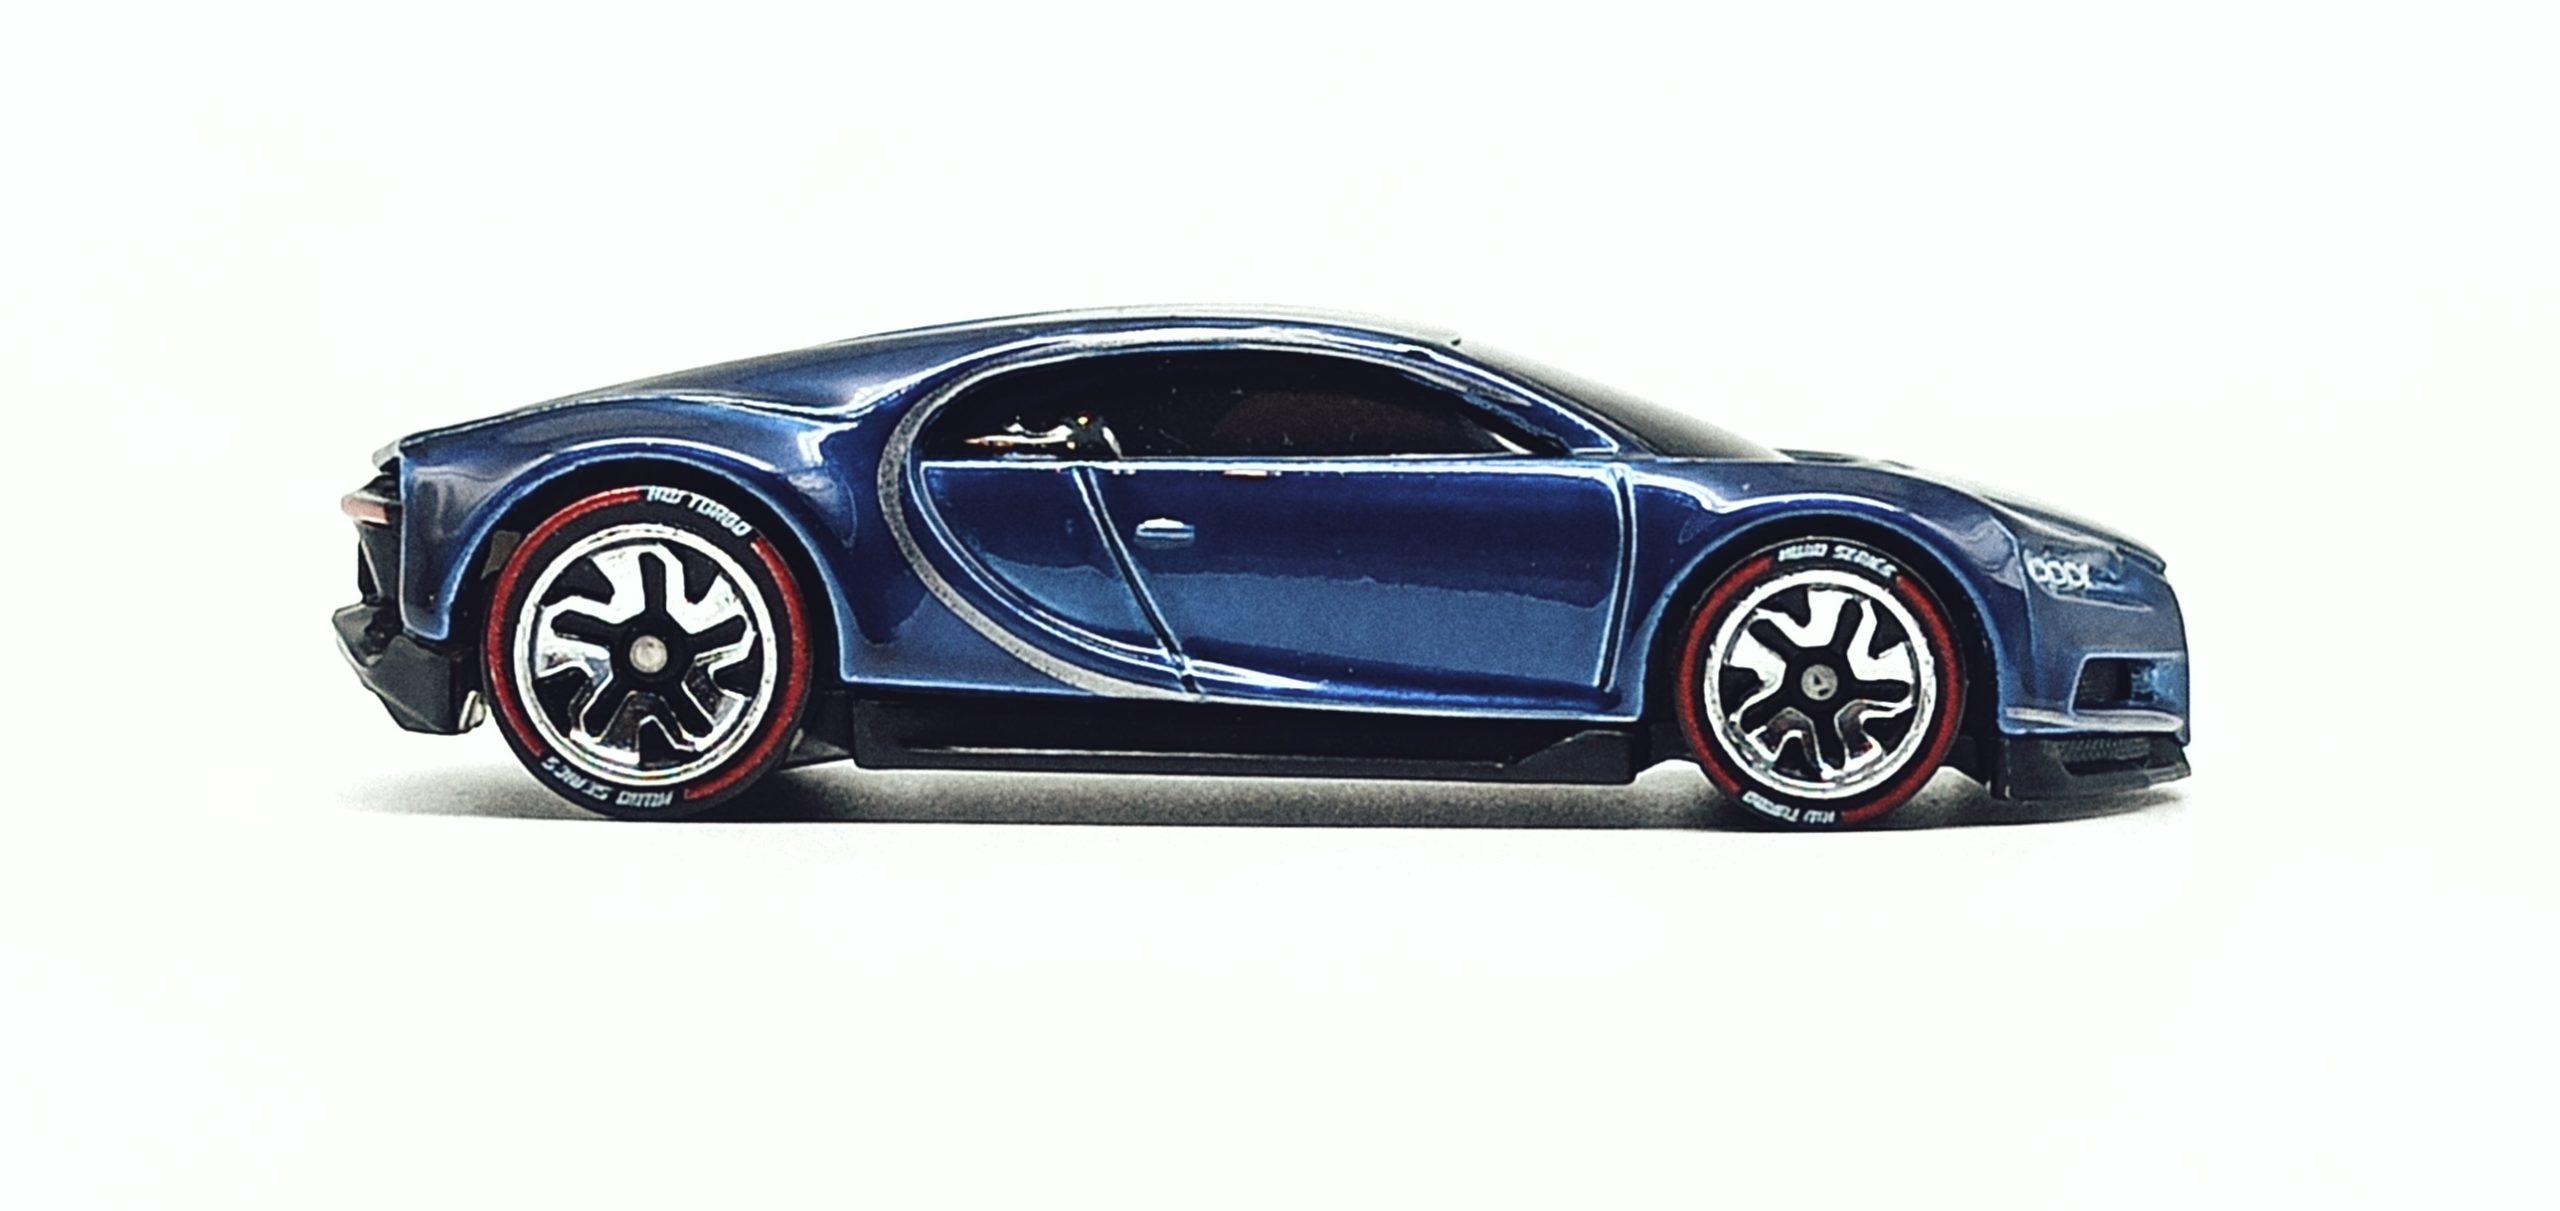 Hot Wheels id '16 Bugatti Chiron (HBG00) 2021 HW Turbo (3/4) spectraflame blue side